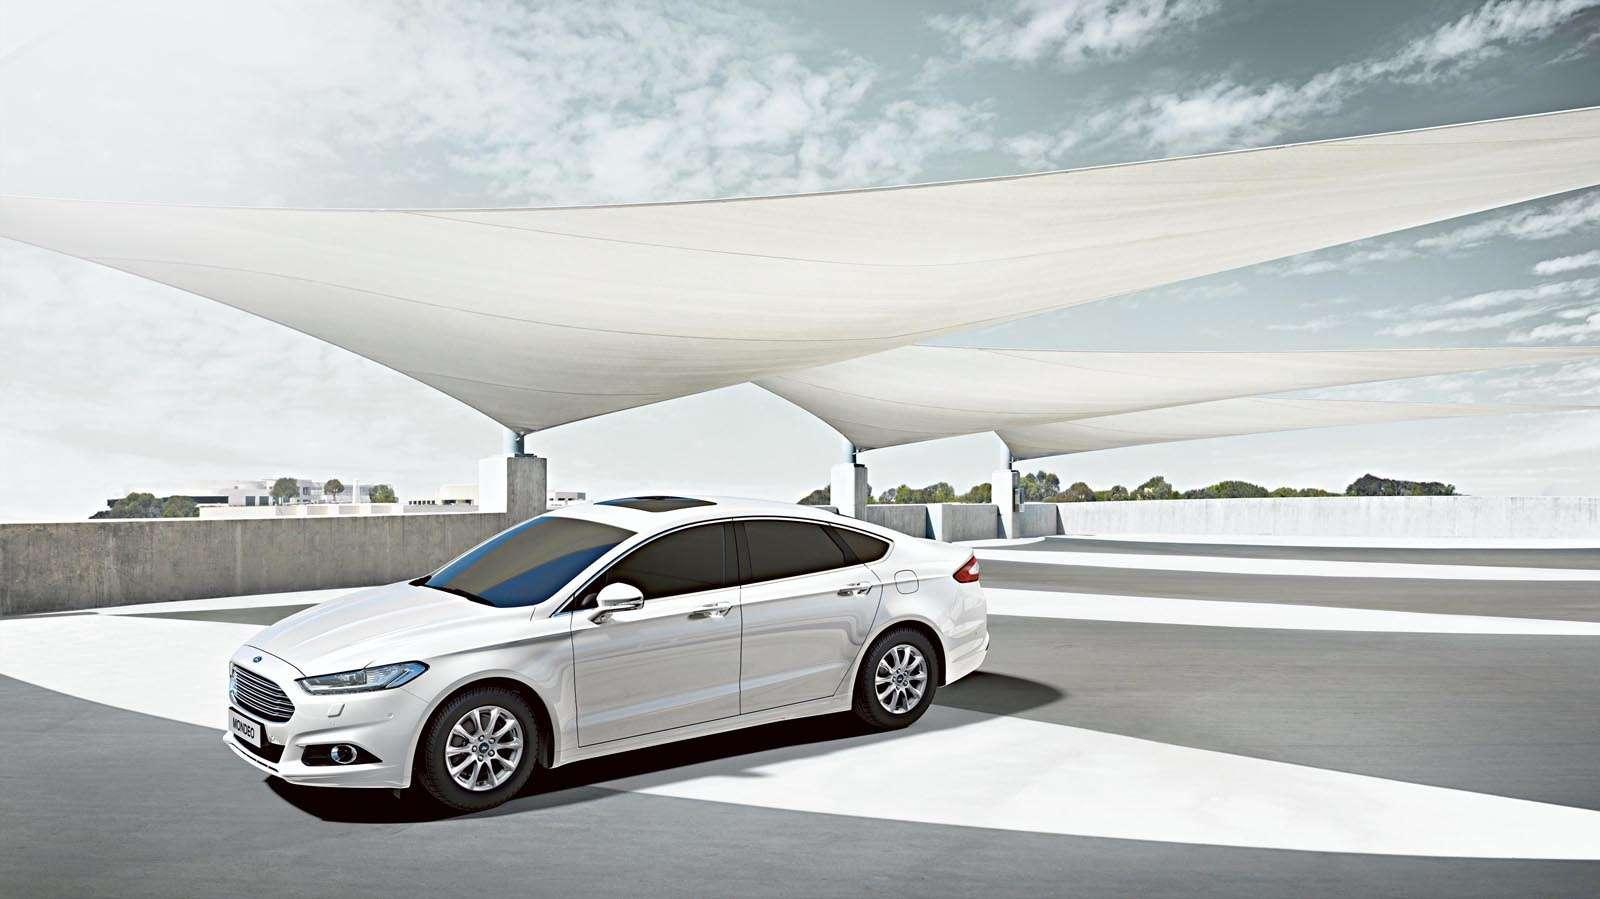 FordMondeo-Hybrid_01(1)